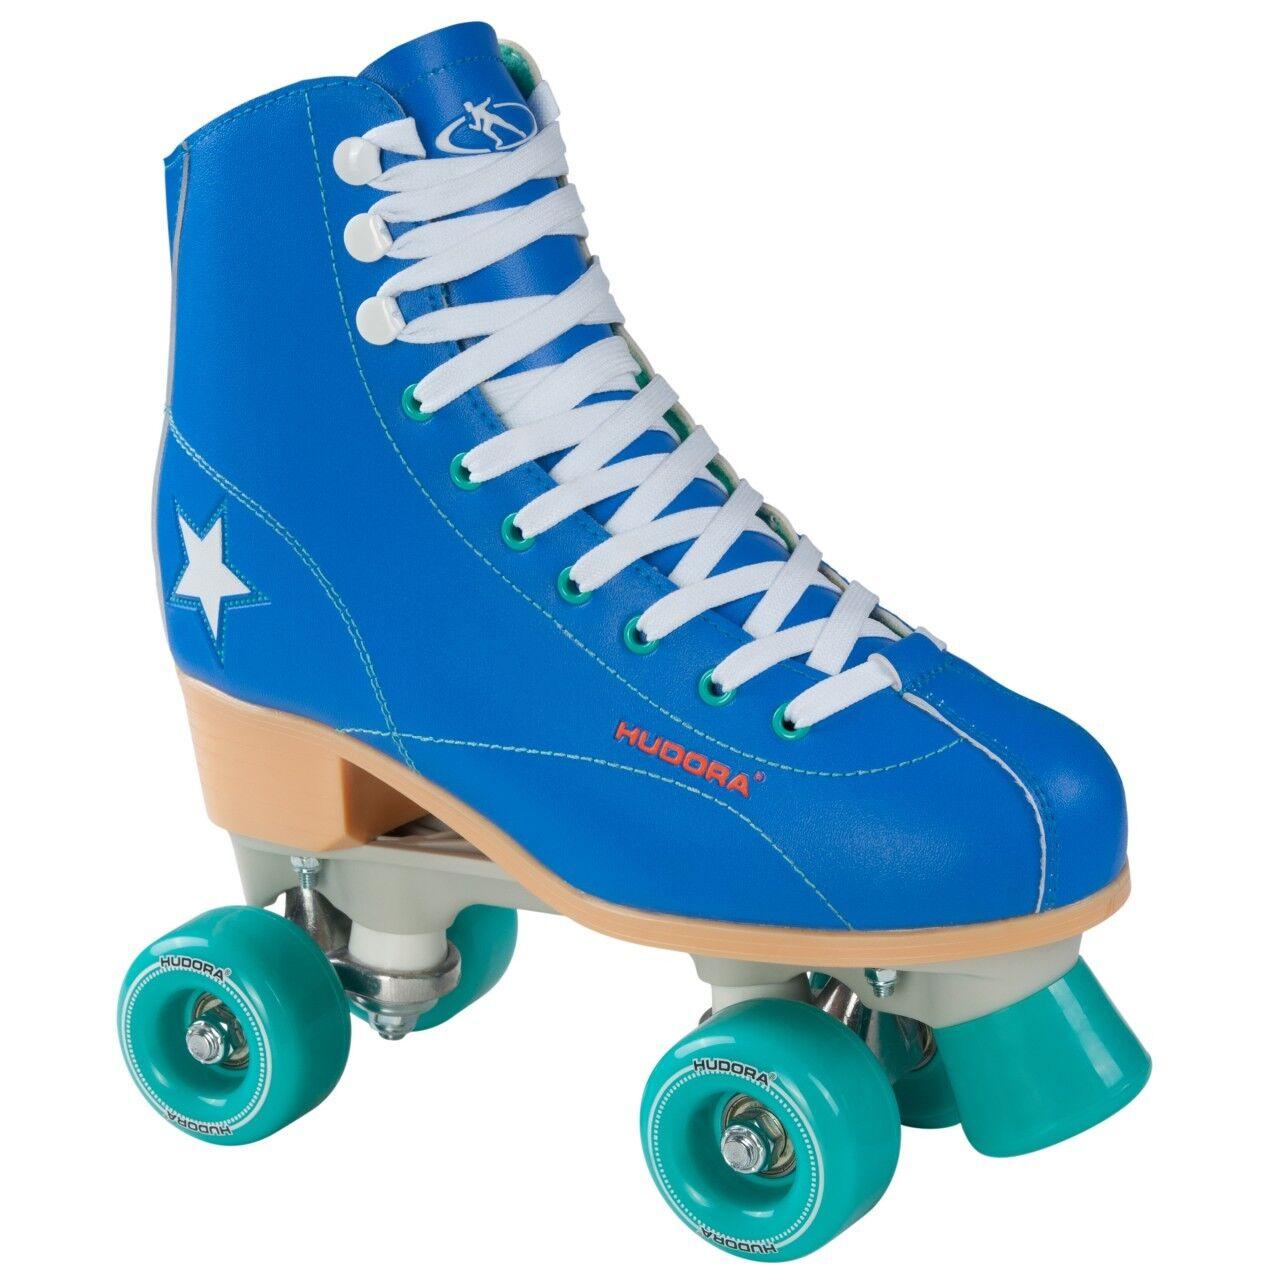 HUDORA Rollschuhe Roller Skate Disco Gr. 43 blau-grün